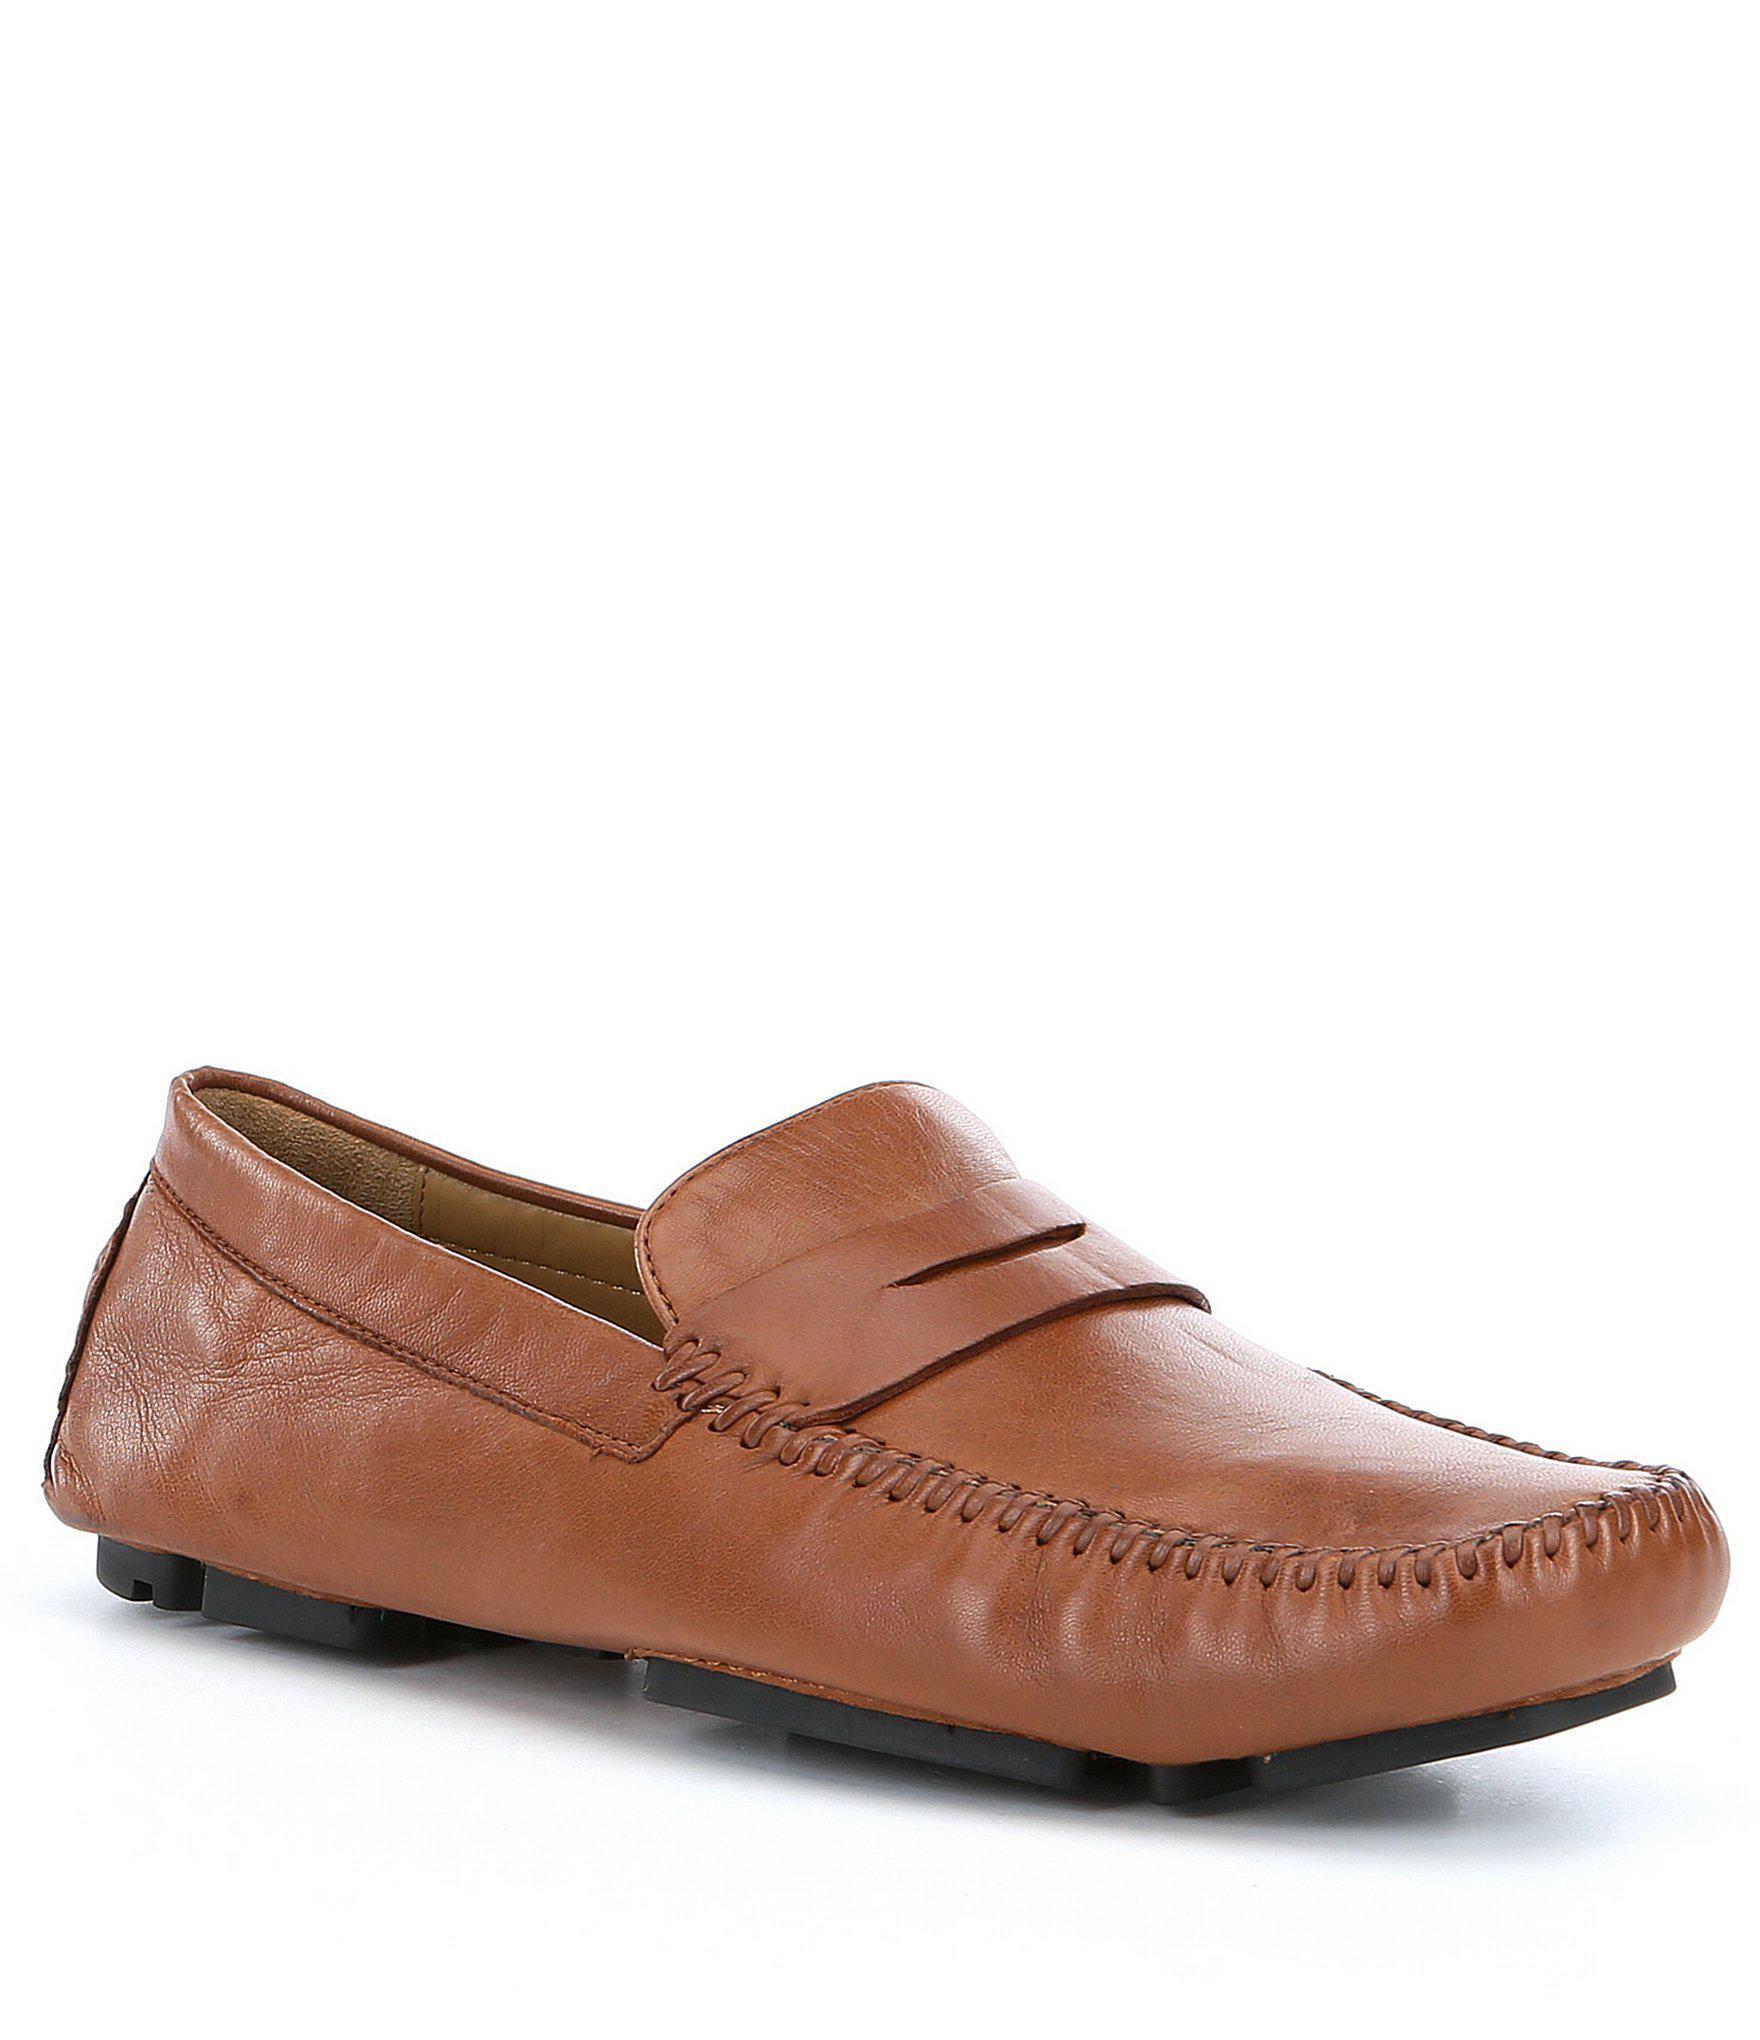 30782ec979b Lyst - Robert Zur Men ́s Sven Leather Penny Loafers in Brown for Men